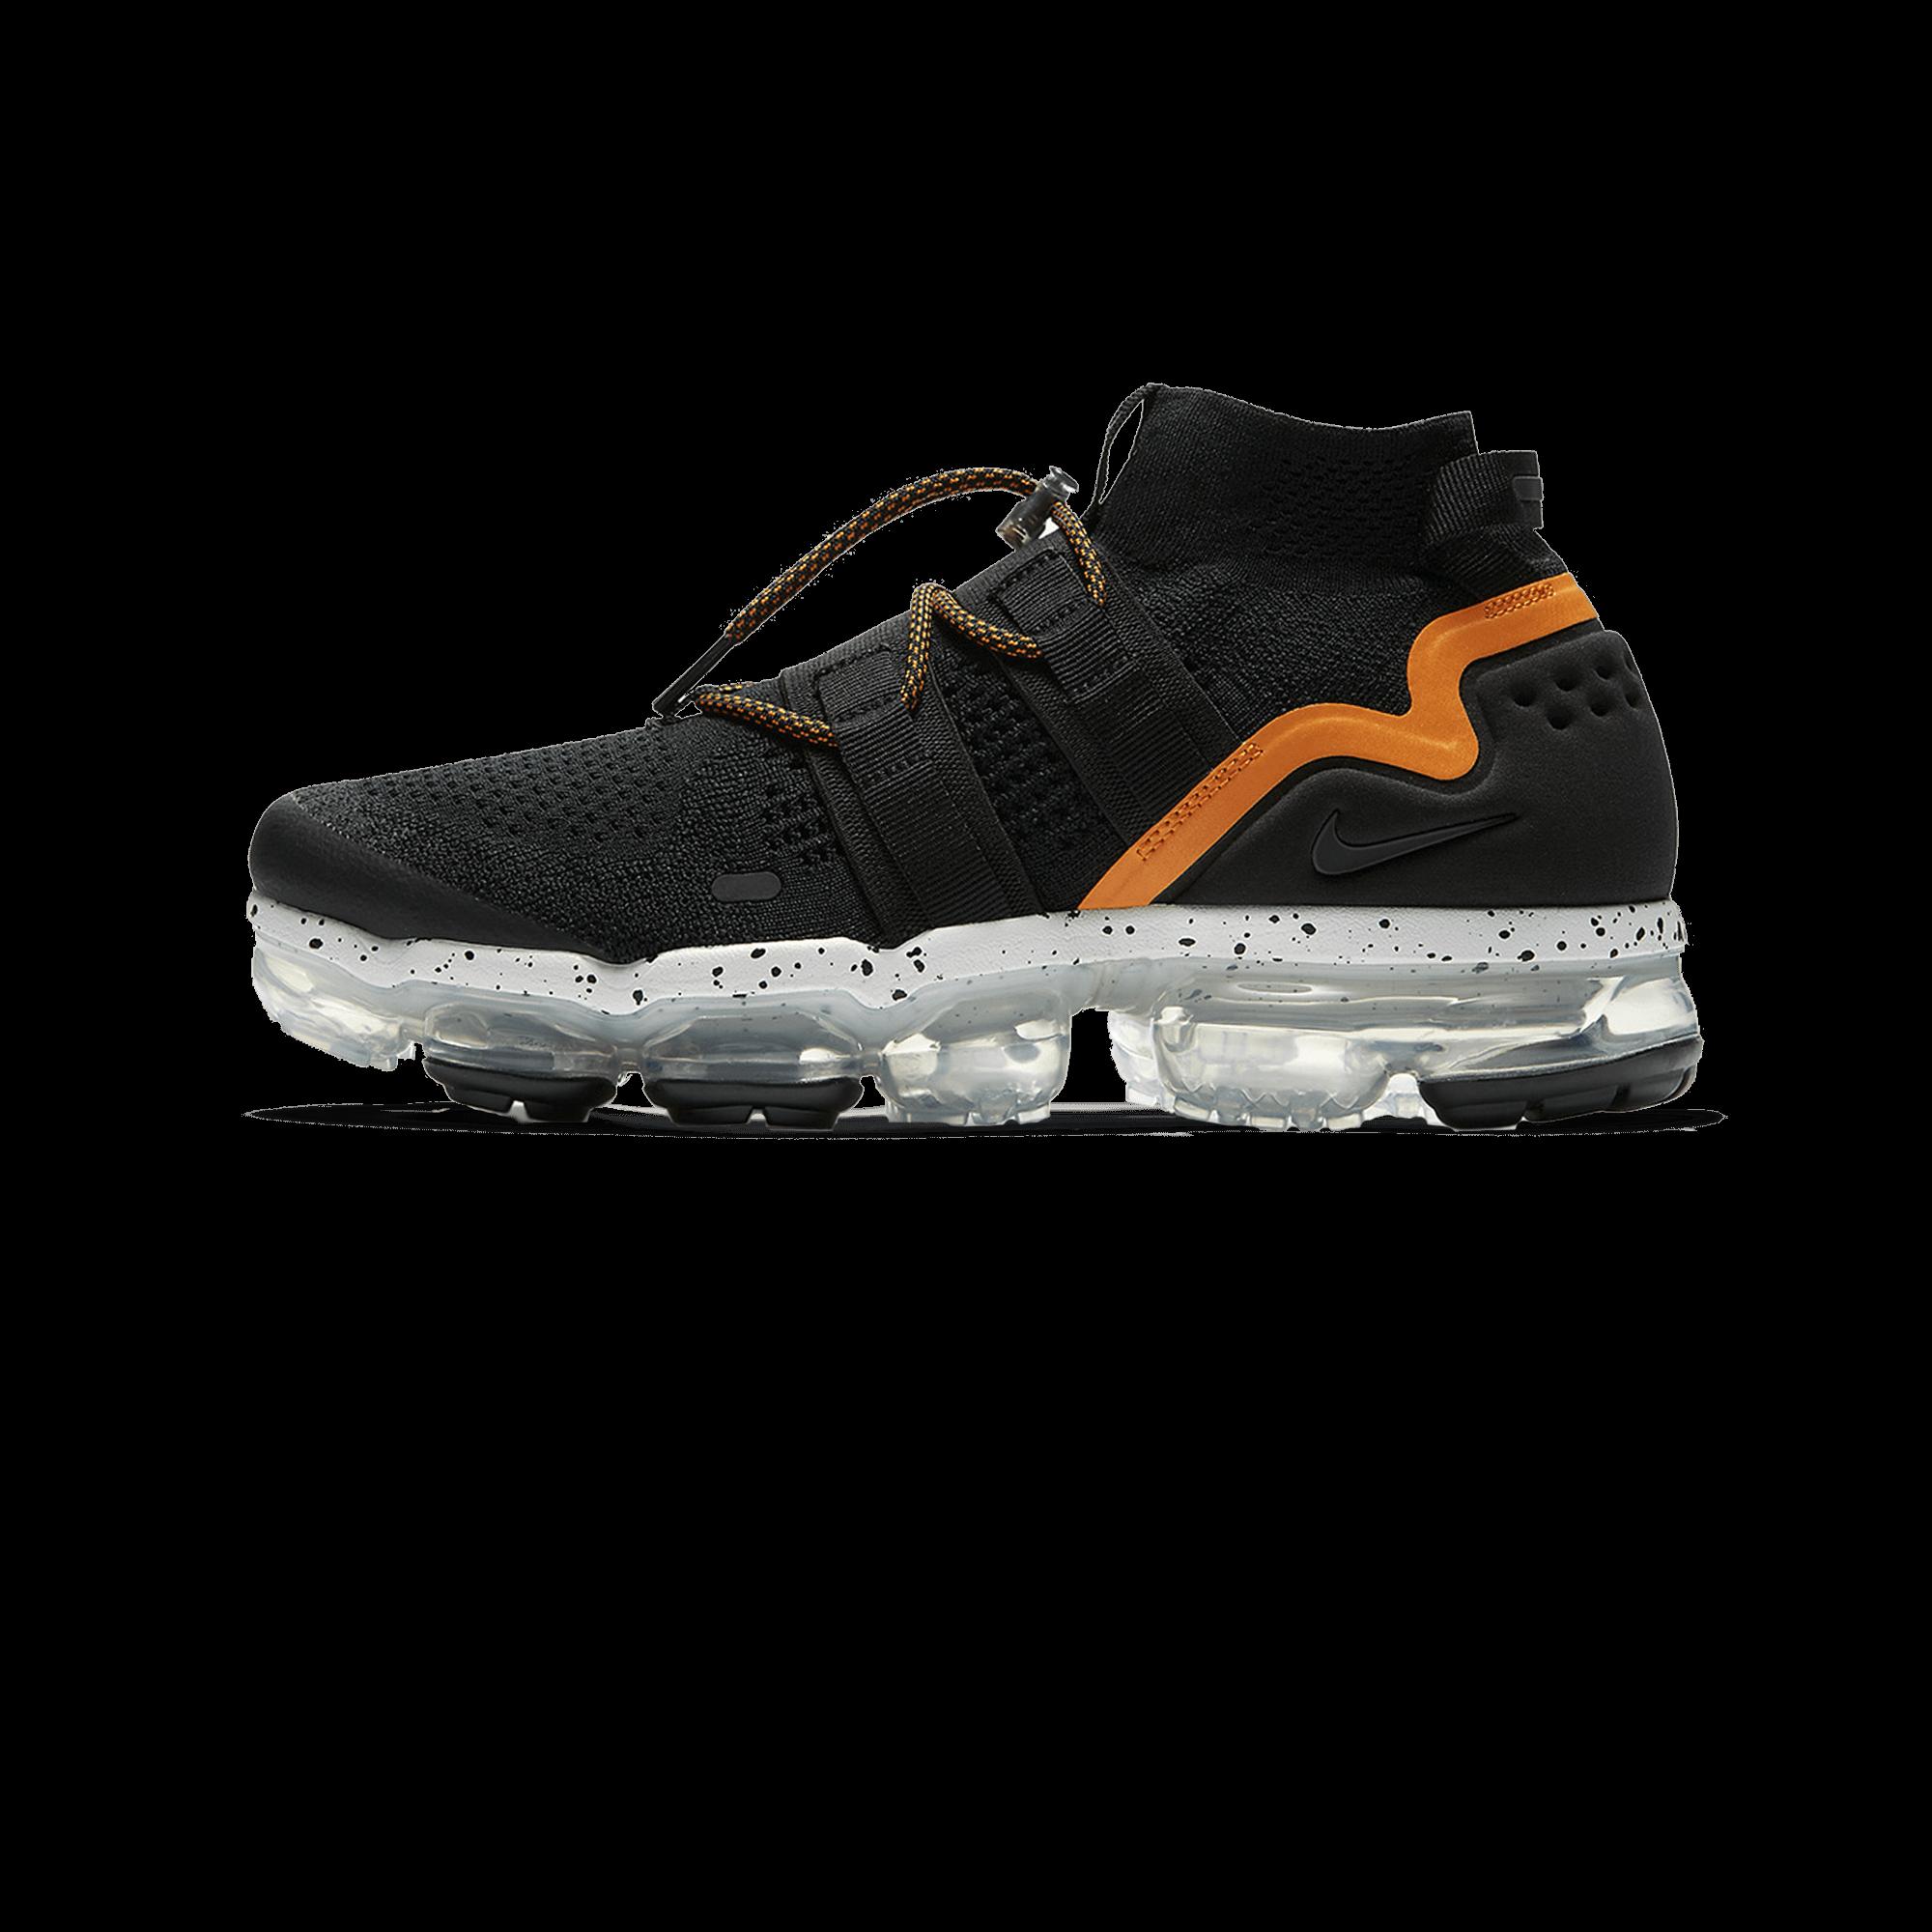 online store fad59 53315 Nike Air Vapormax FK Utility black/orange peel - Men | Holypopstore.com